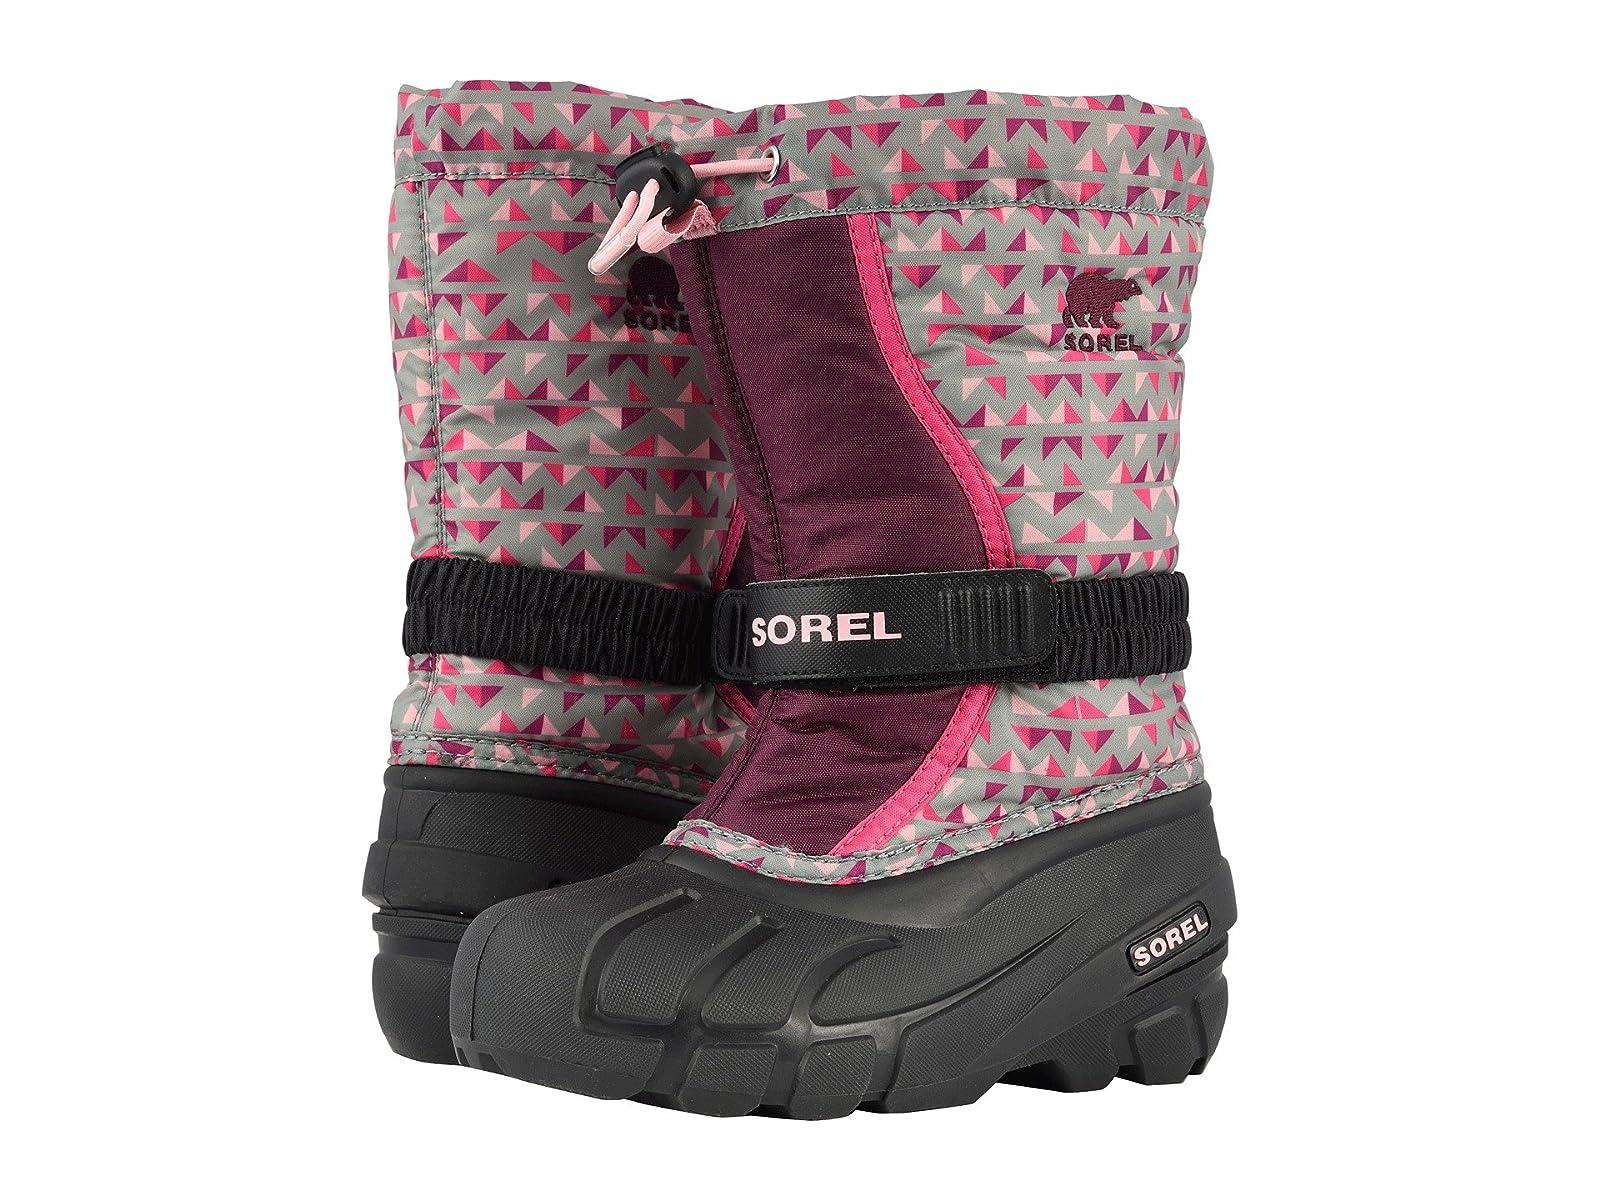 SOREL Kids Flurry™ Print (Toddler/Little Kid/Big Kid)Economical and quality shoes